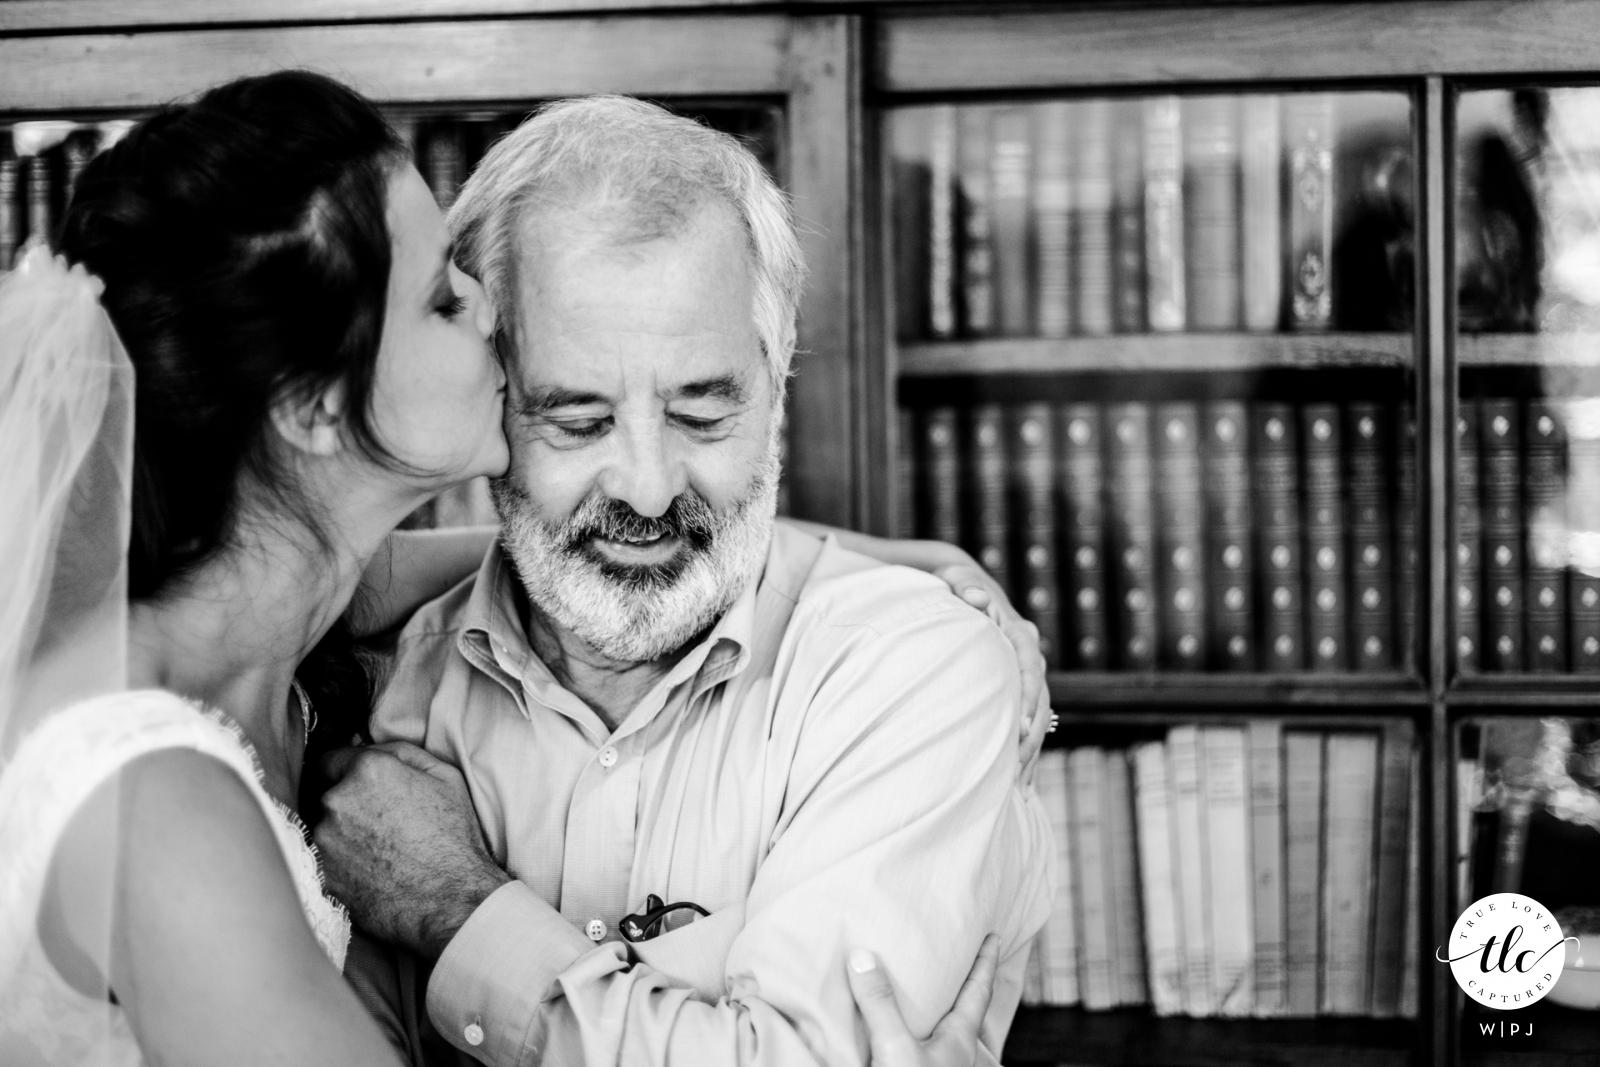 Normandie wedding image of true love showing Dad discovering his bride daughter